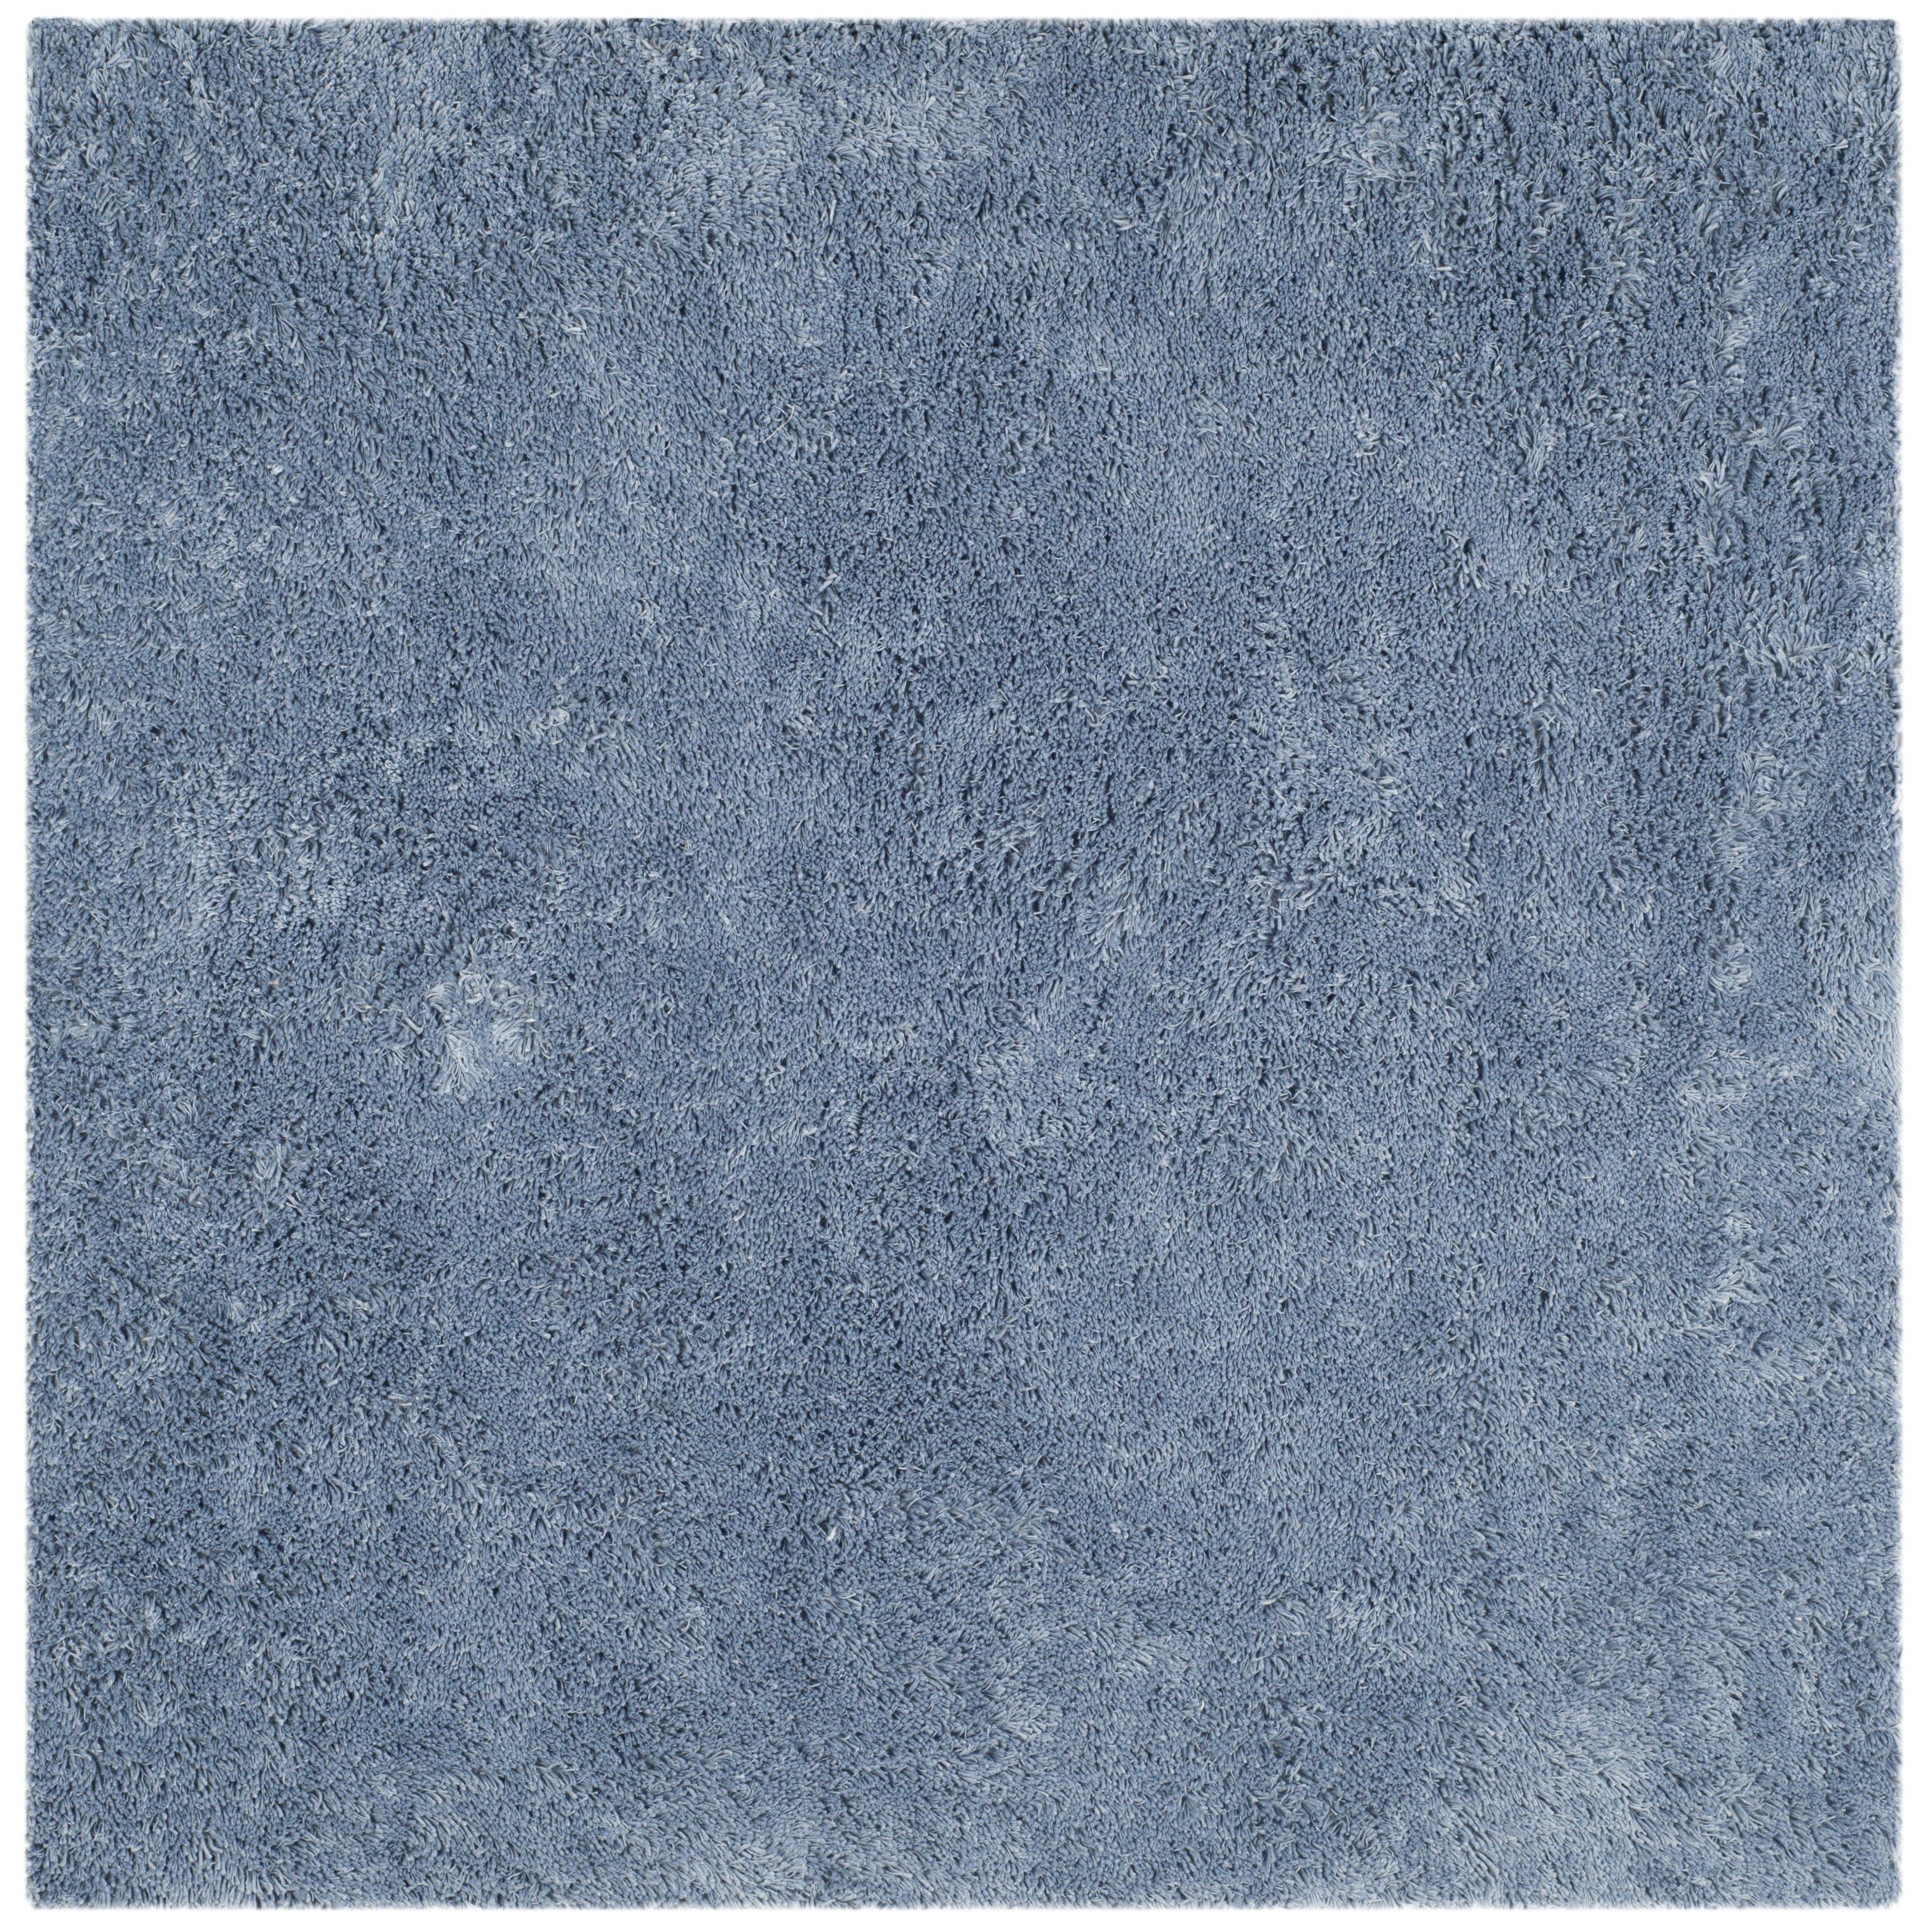 Safavieh Shag Light Blue Area Rug Amp Reviews Wayfair